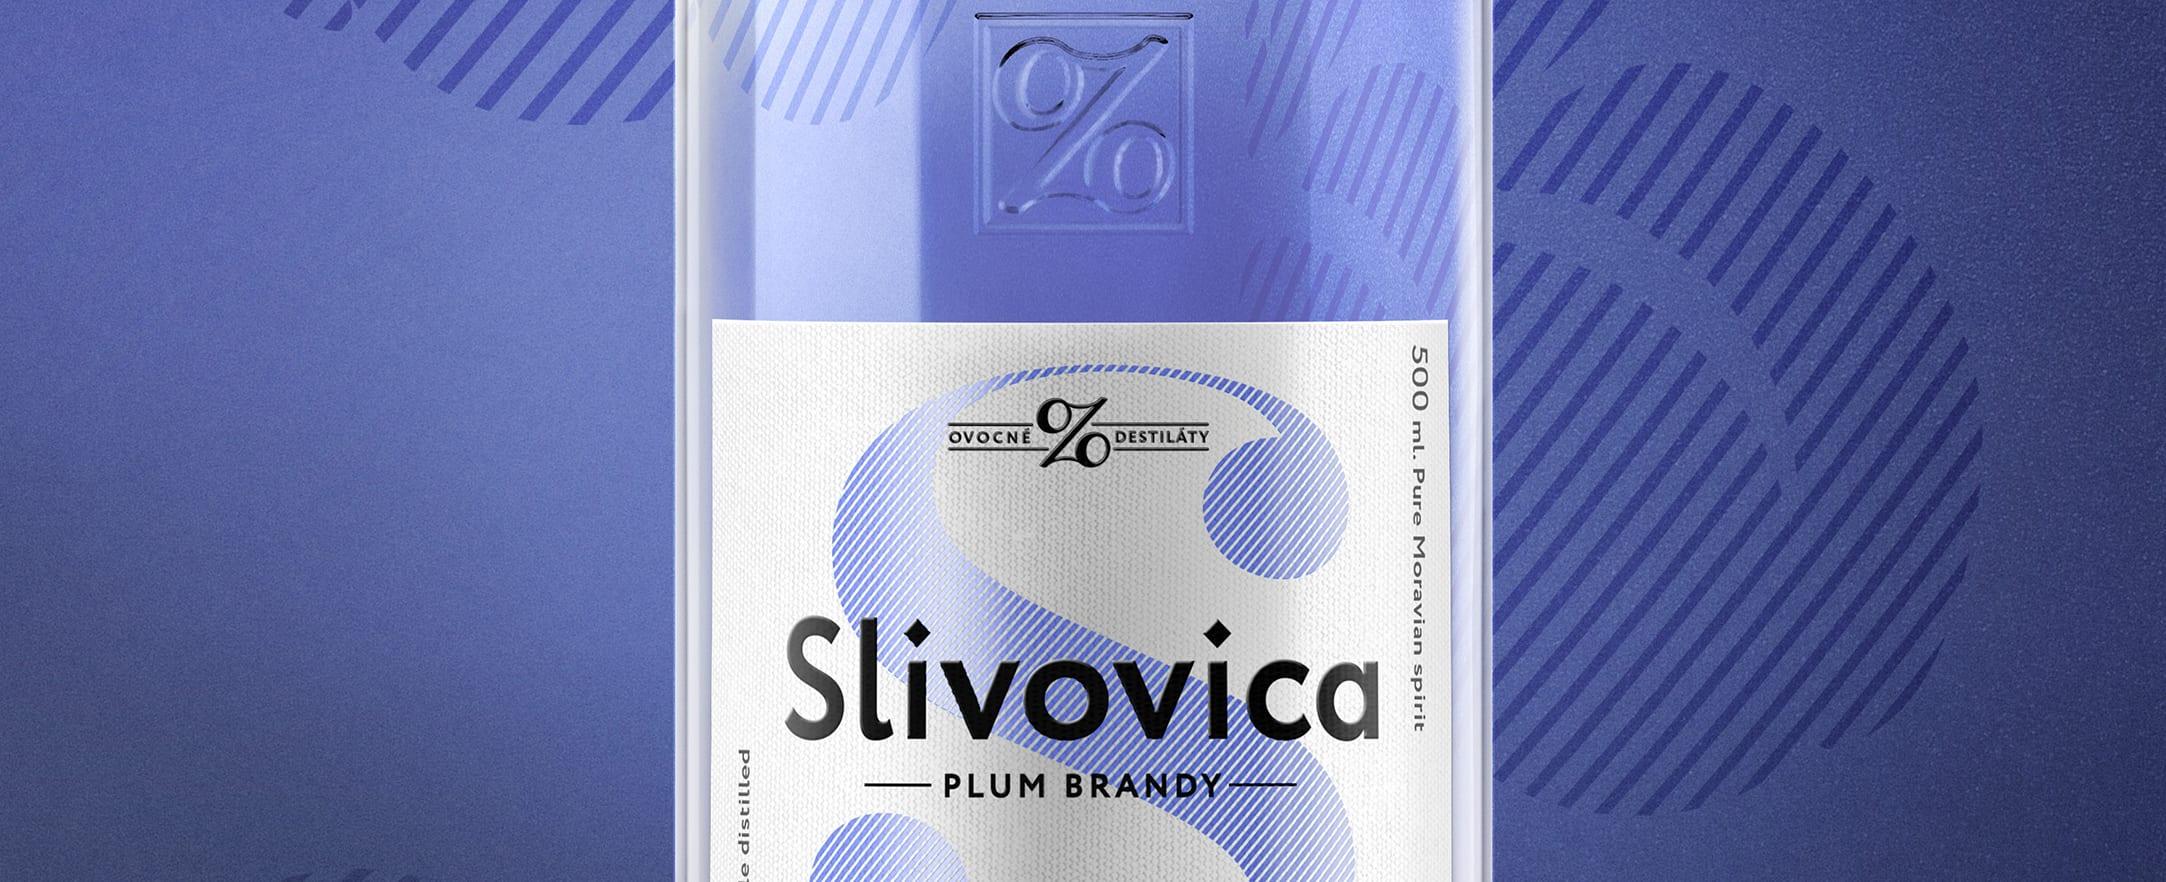 Slivovice Žufánek